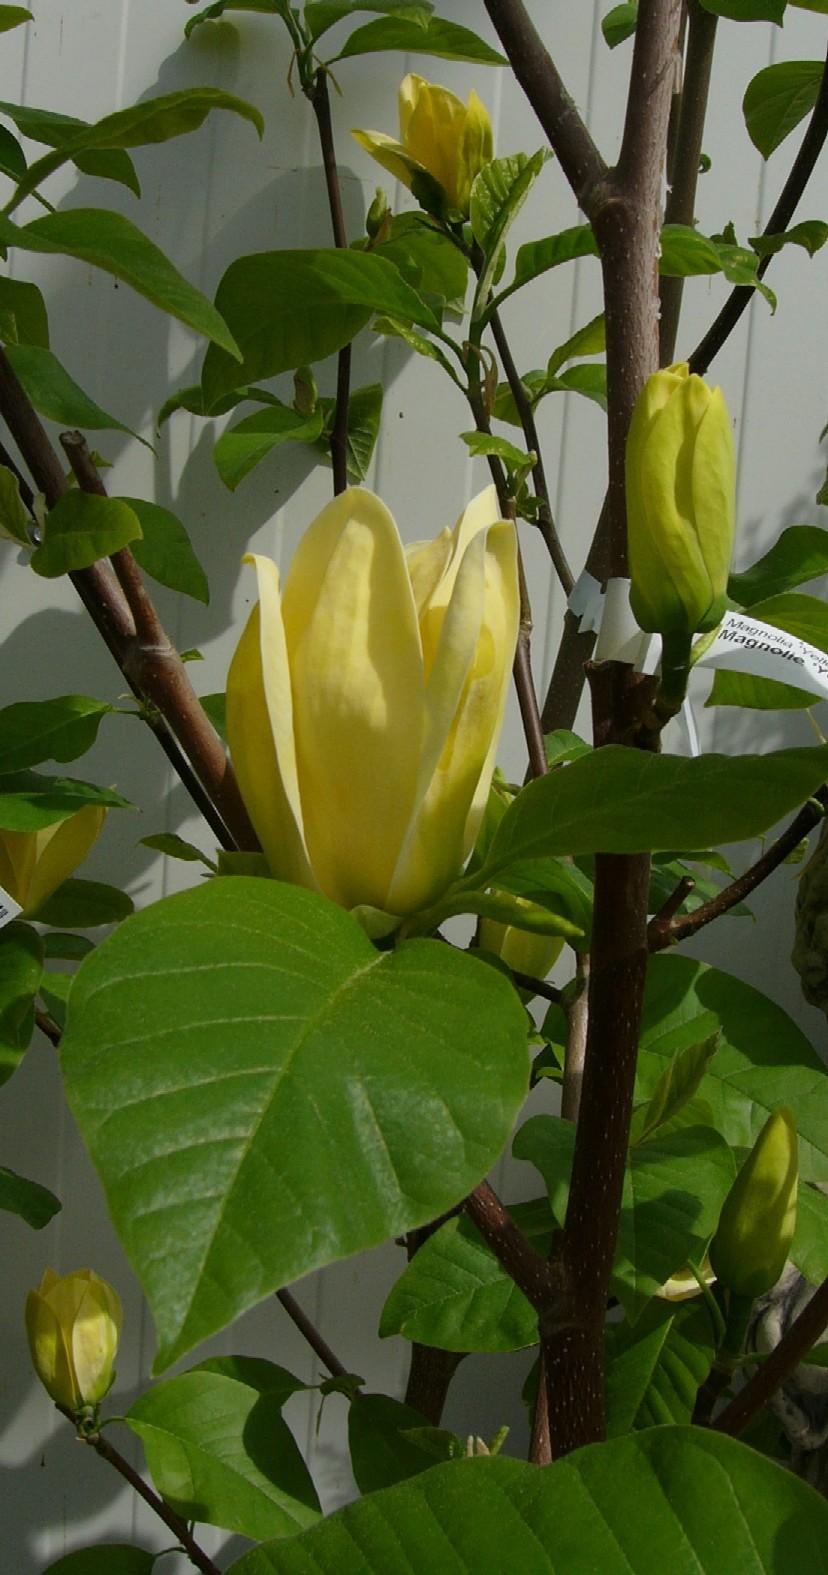 magnolia gelb. Black Bedroom Furniture Sets. Home Design Ideas